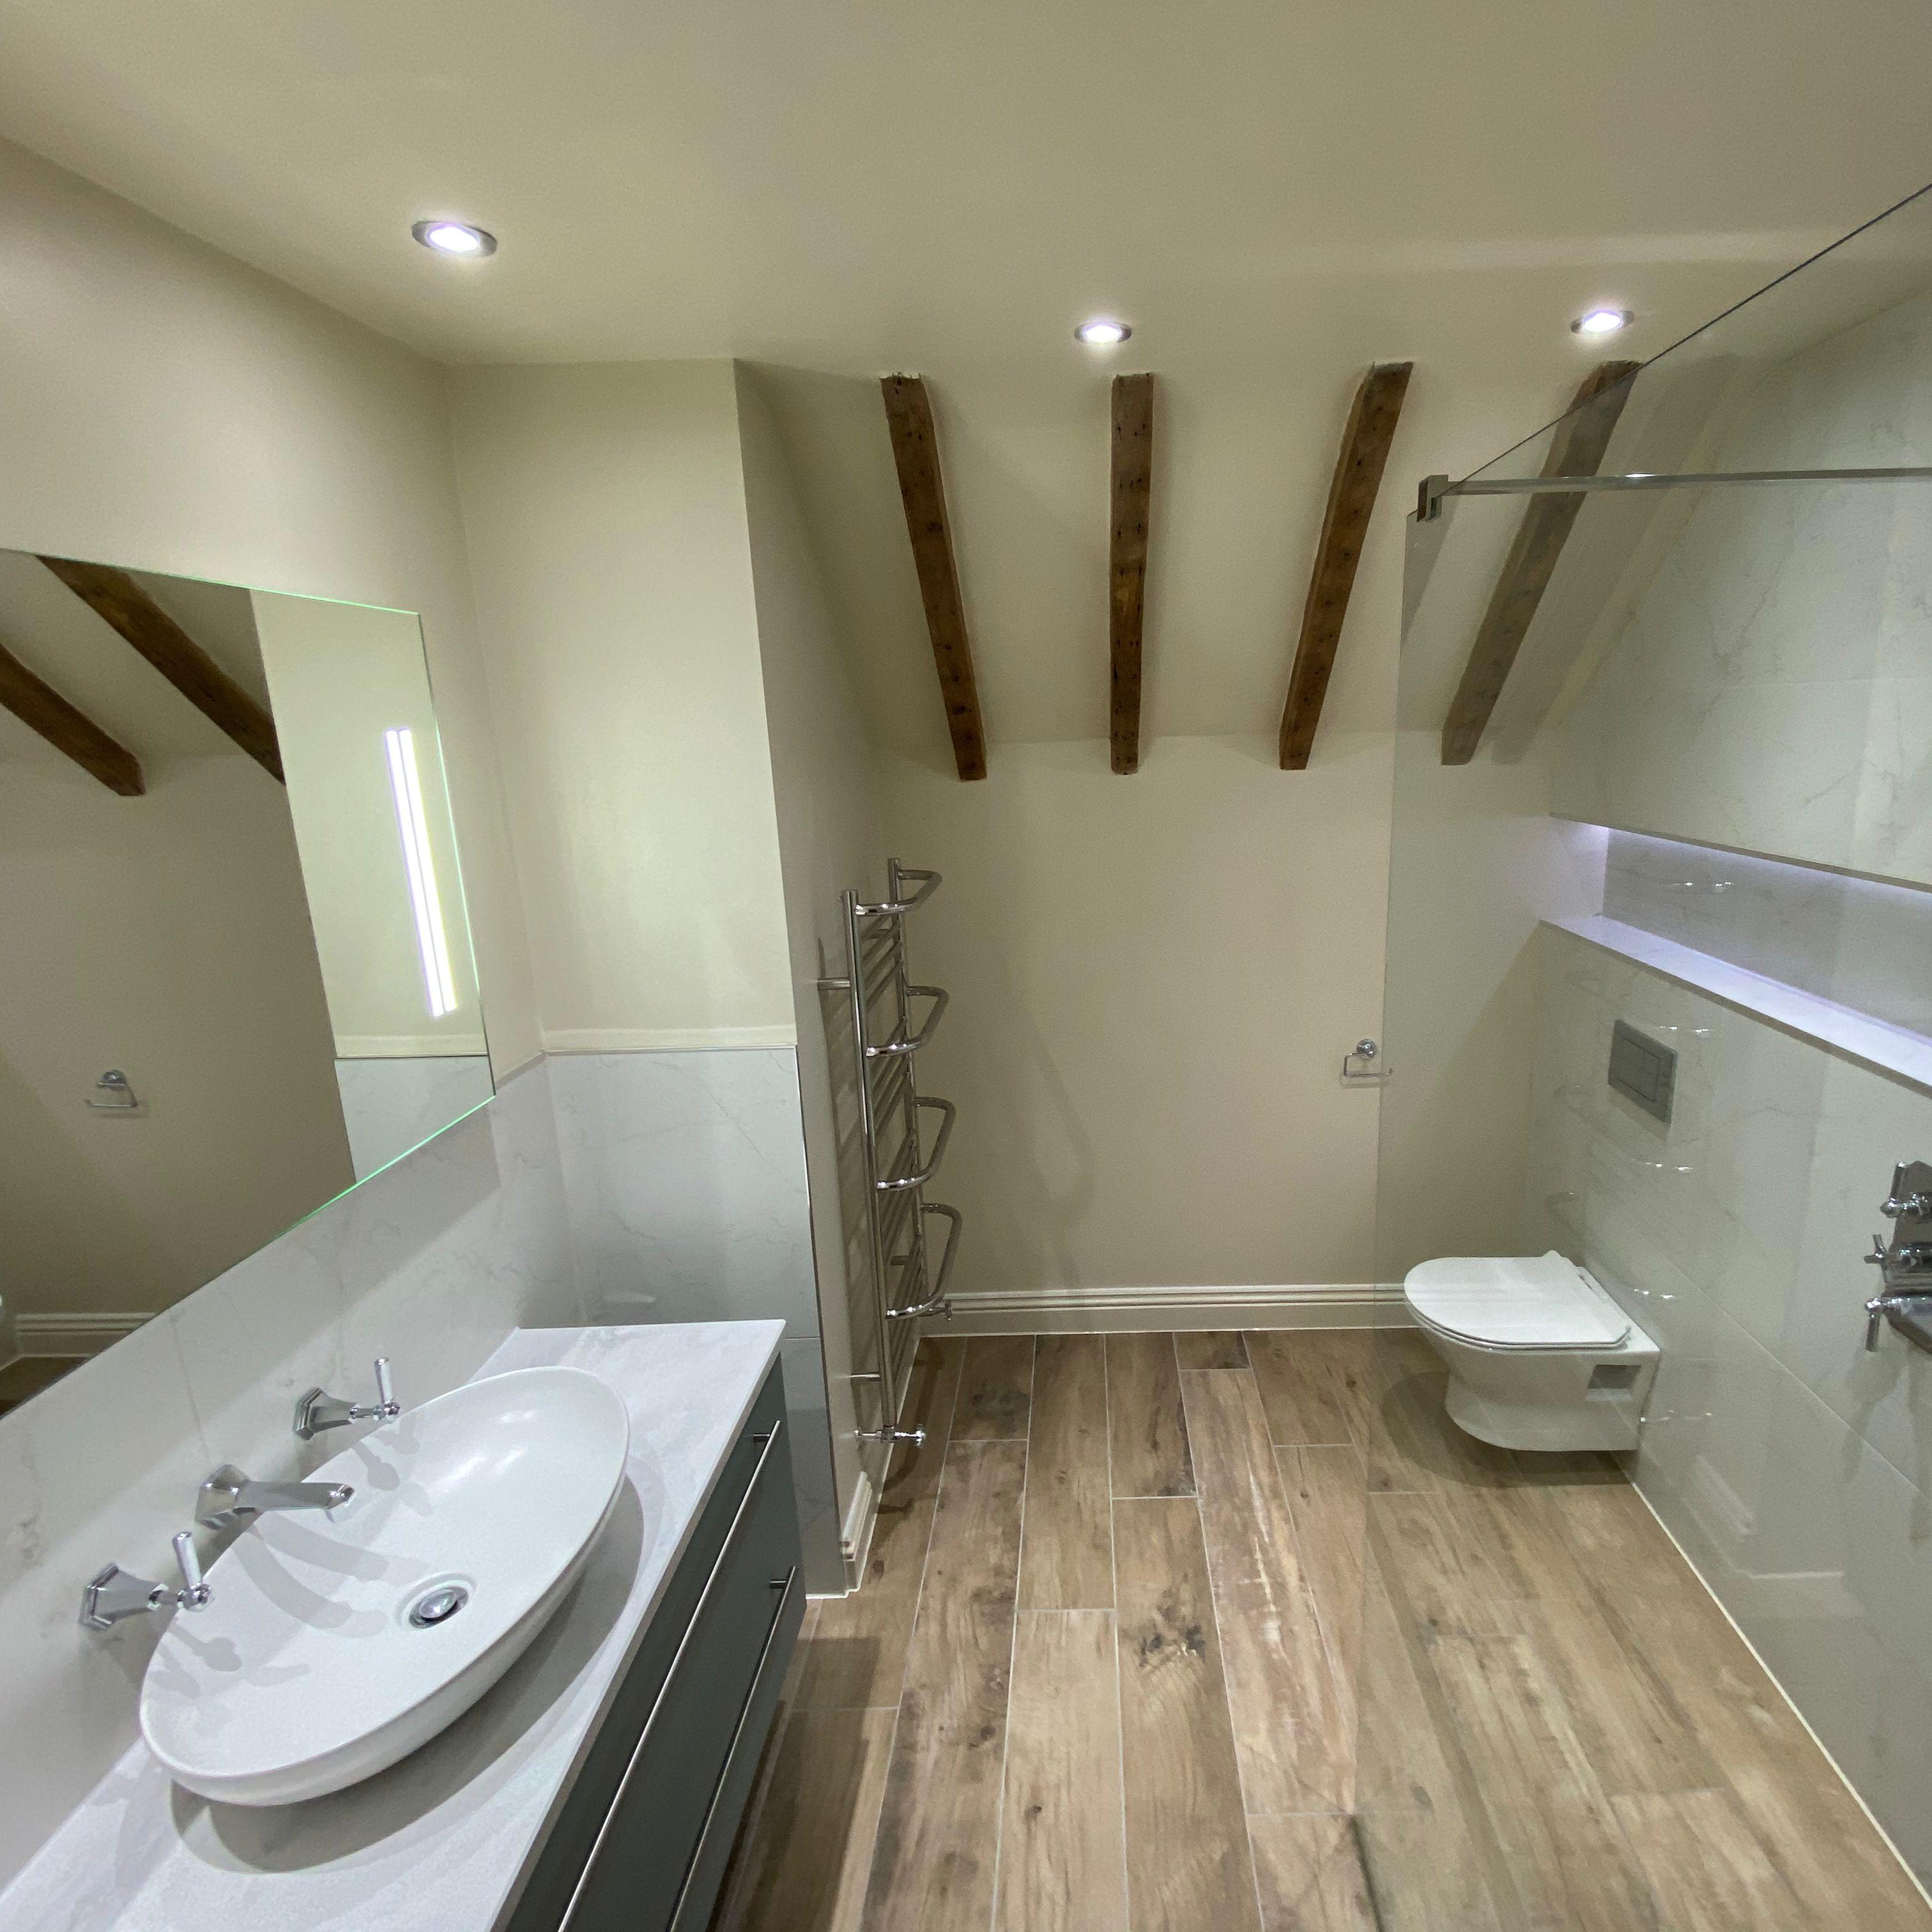 Spacious wetroom   Bathrooms remodel, Bathroom design ...